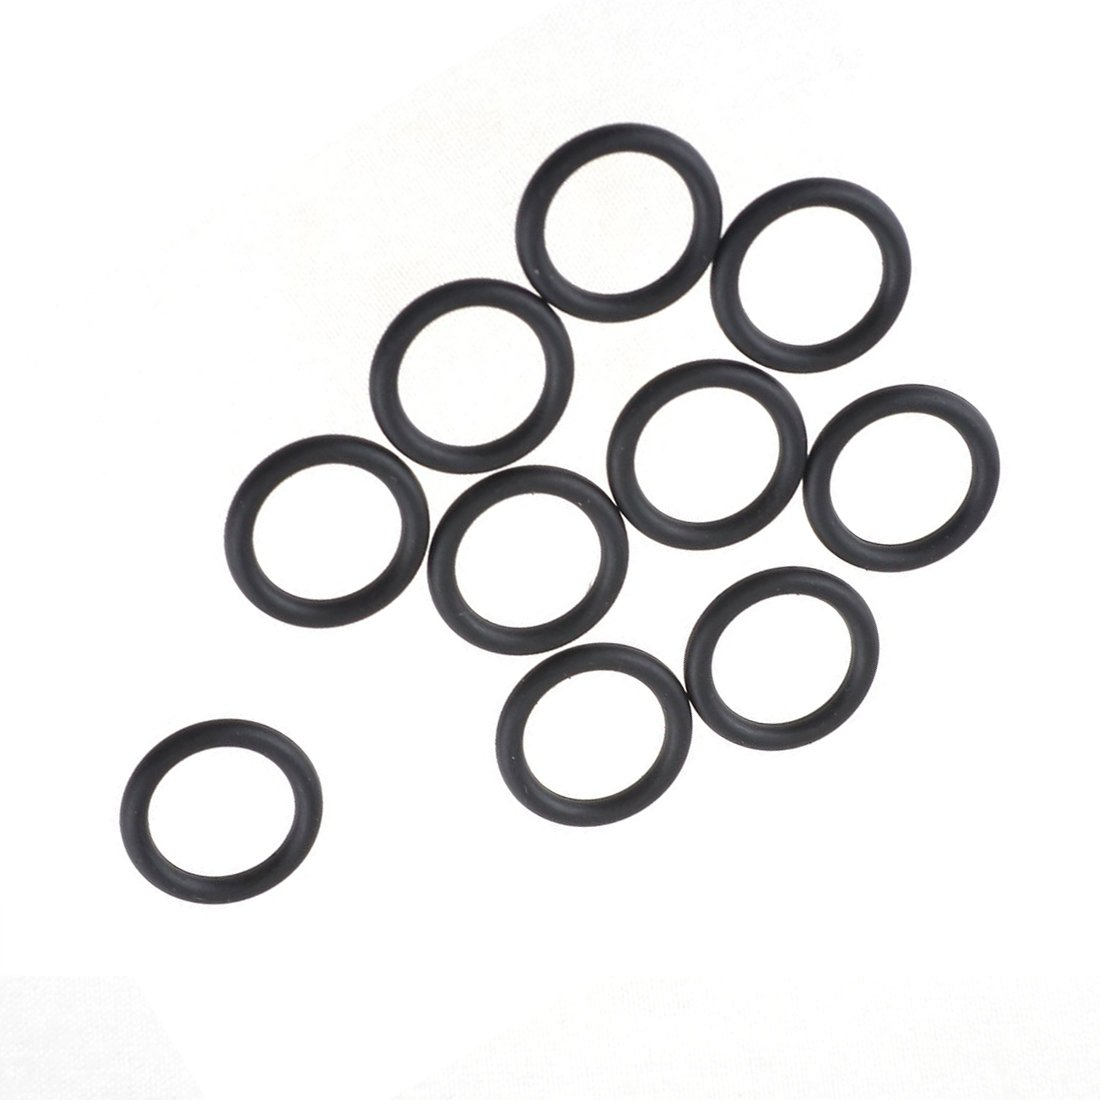 R O Shaped Dichtung Unterlegscheiben TOOGOO 10 Stueck Schwarz Gummi Oil Seal O Shaped Ringe Dichtung Unterlegscheiben 10x2 mm